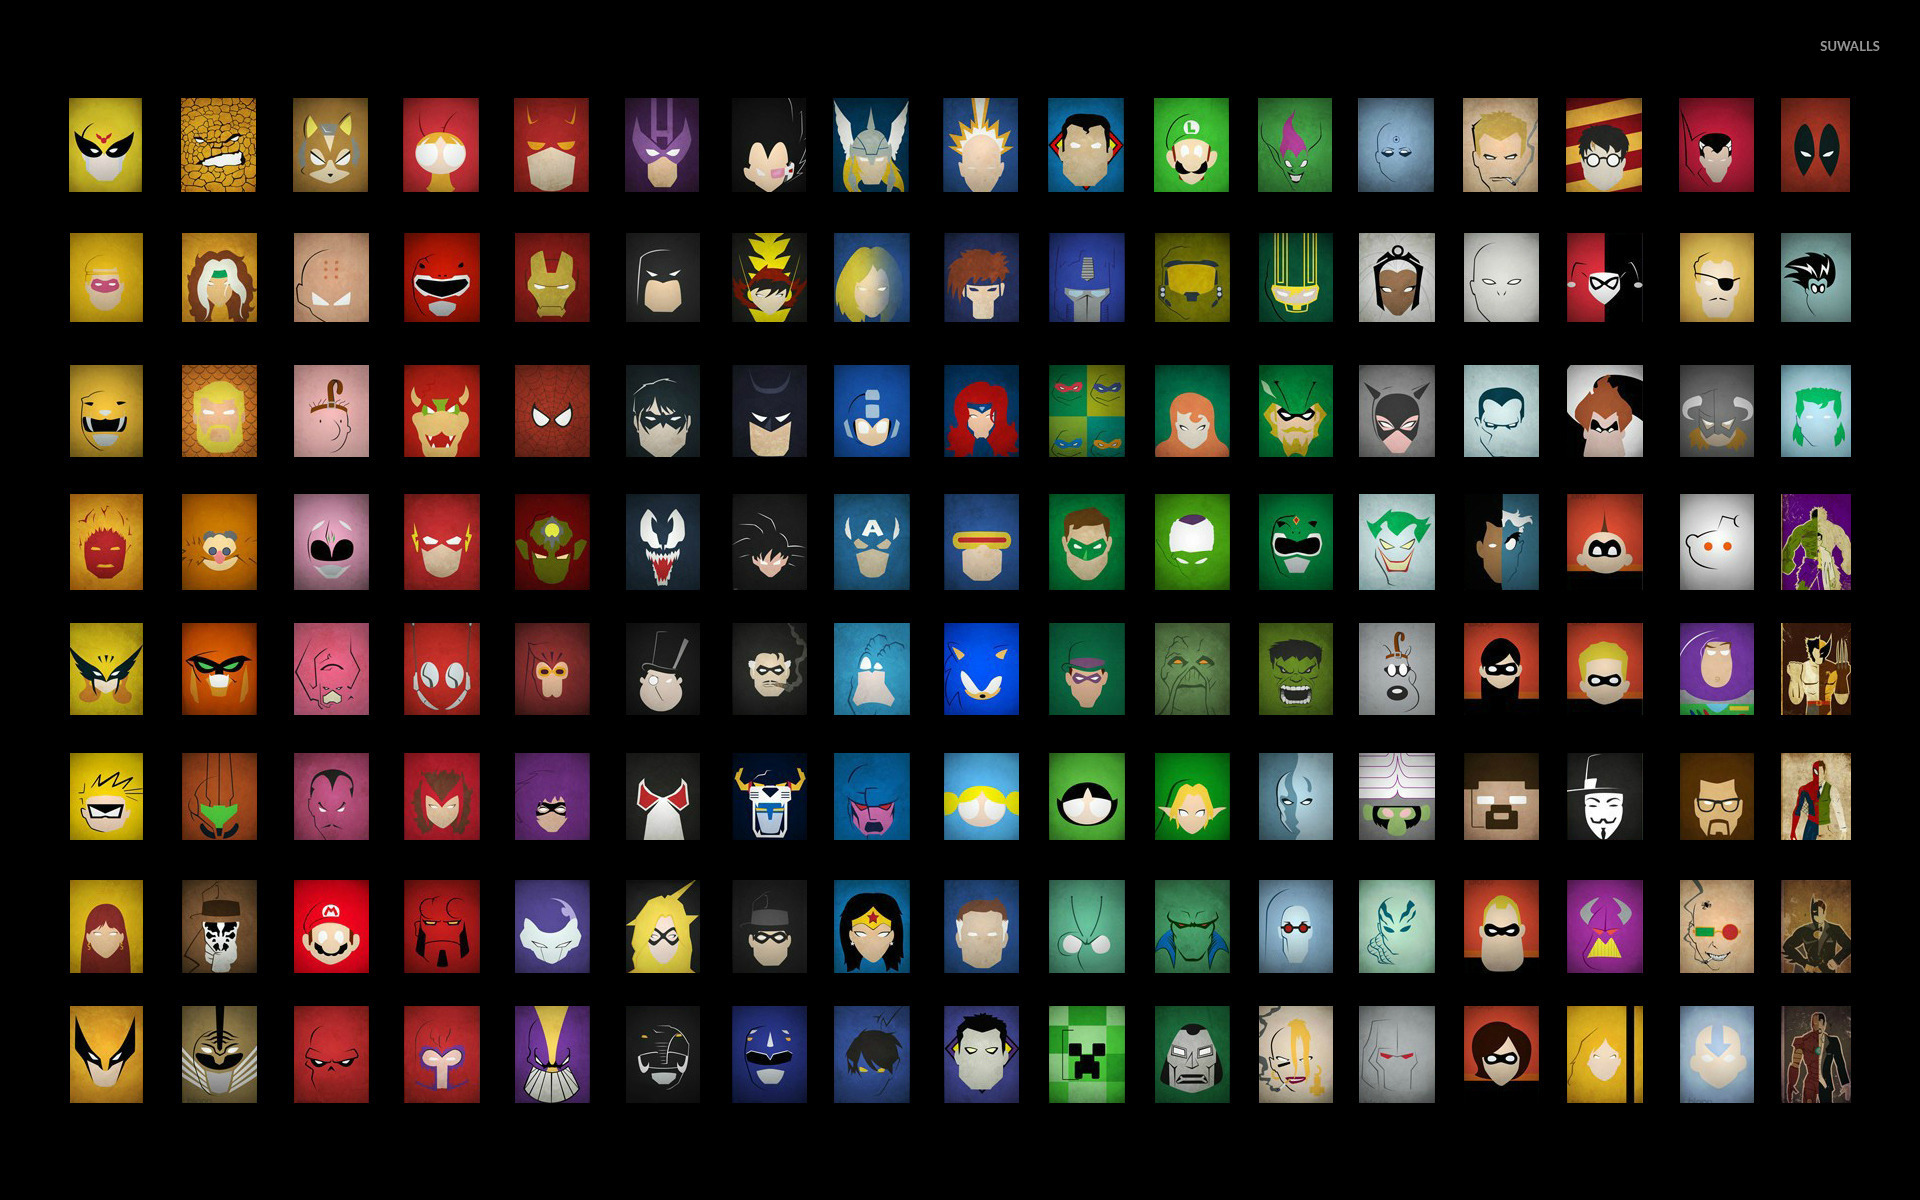 Superheroes wallpaper   Comic wallpapers   21007 1366x768